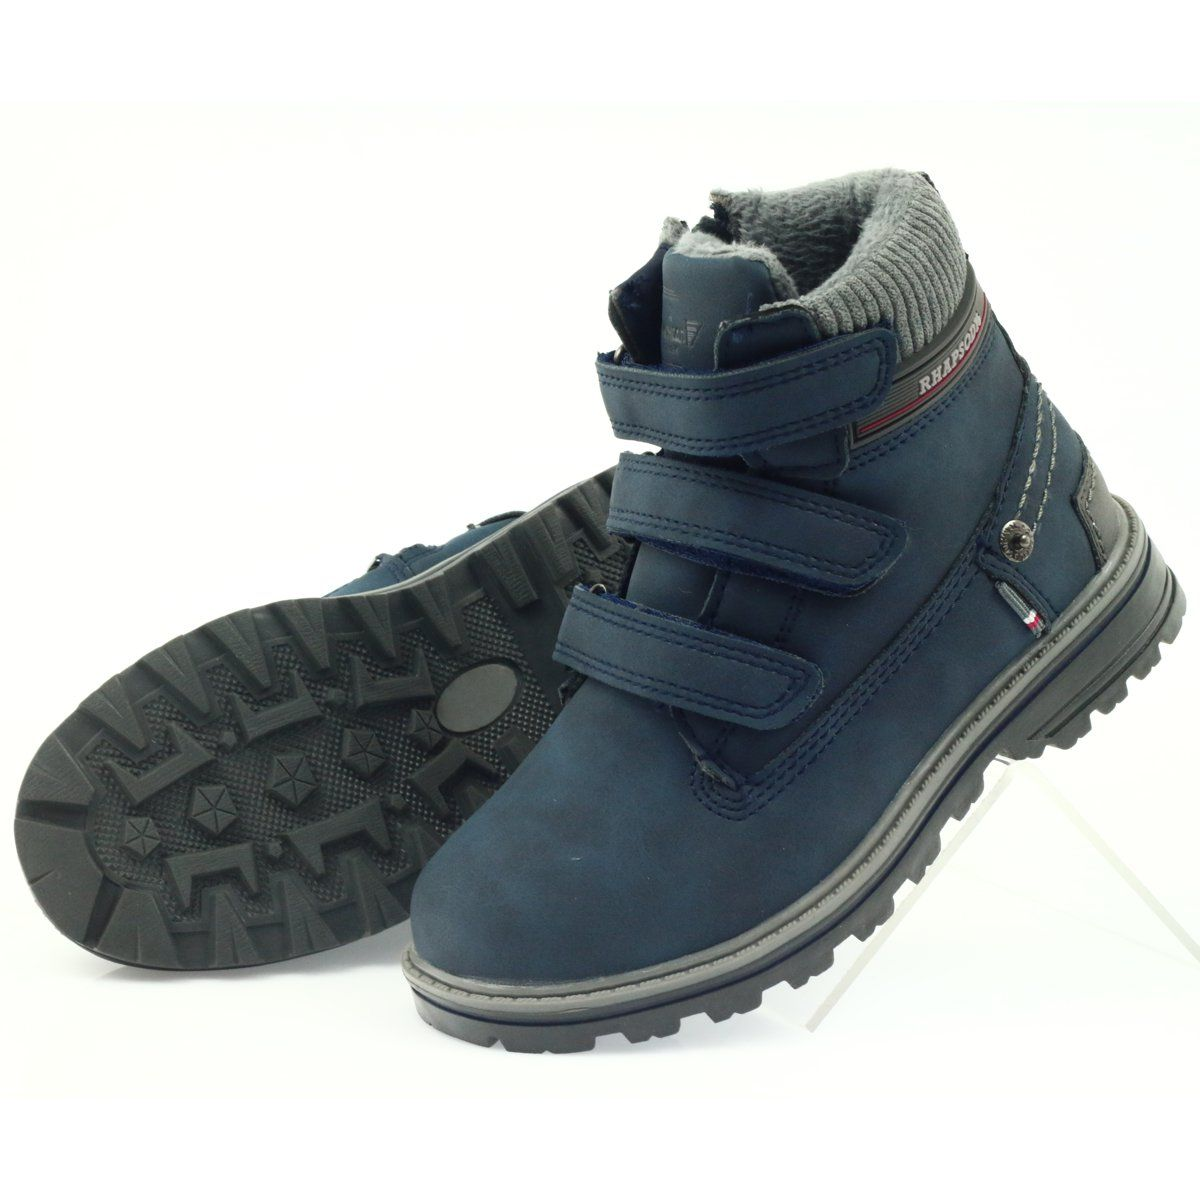 American Club American Kozaki Trzewiki Buty Zimowe 708121 Szare Granatowe Shoes Fisherman Sandal Sandals